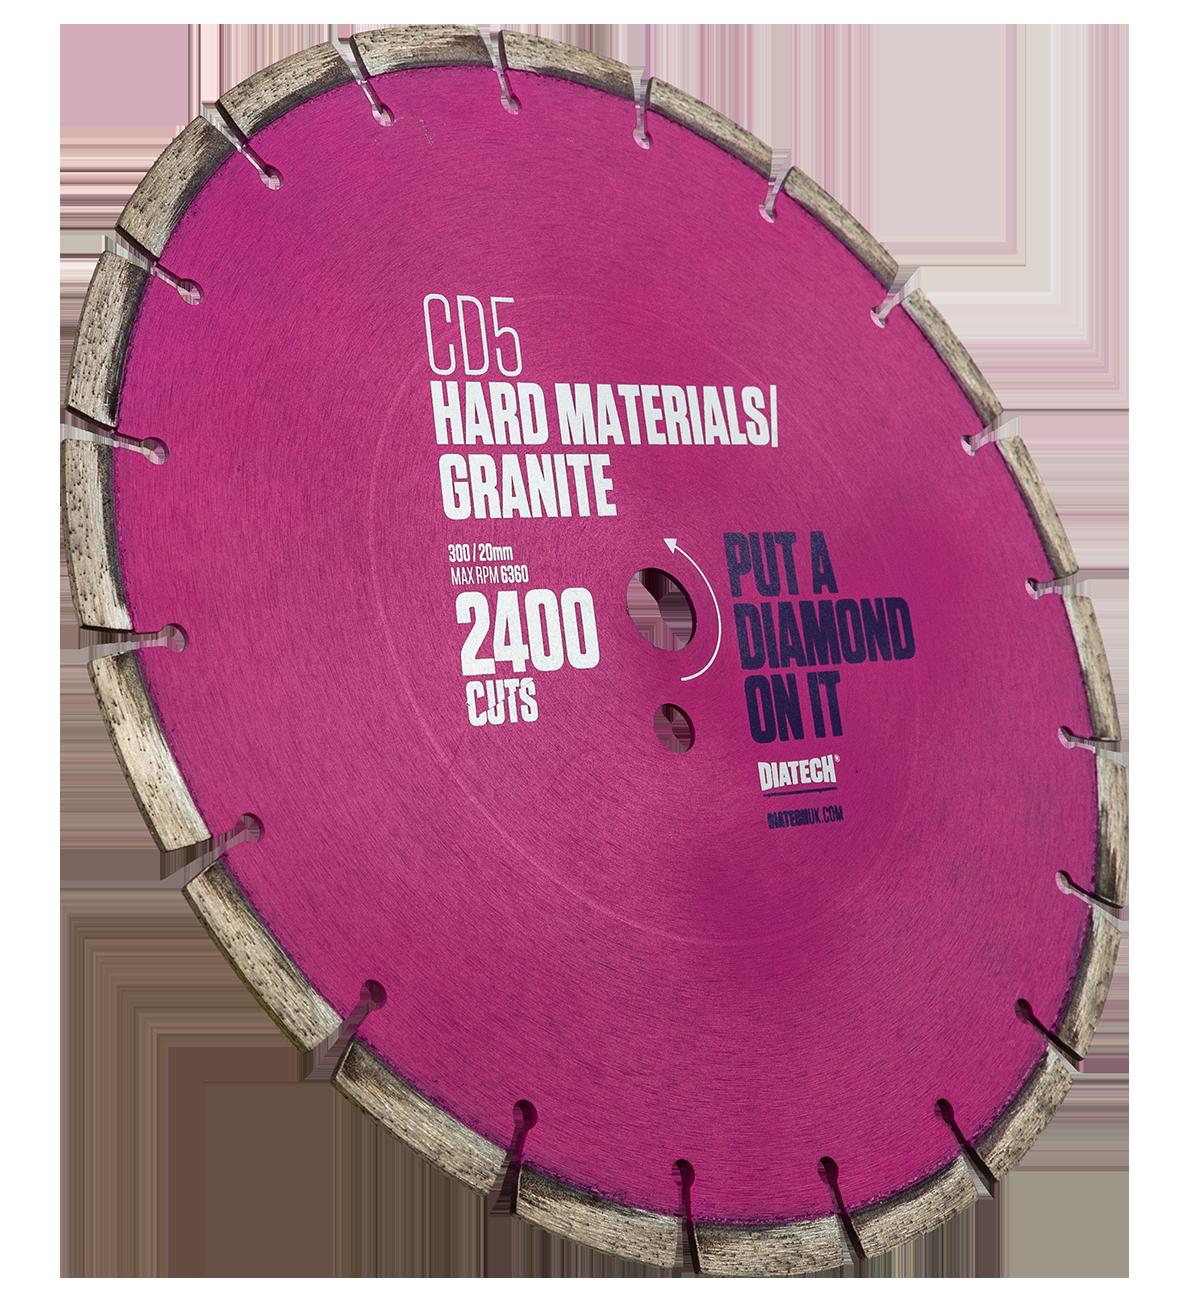 Diamond Blades for Cutting Granite CD5